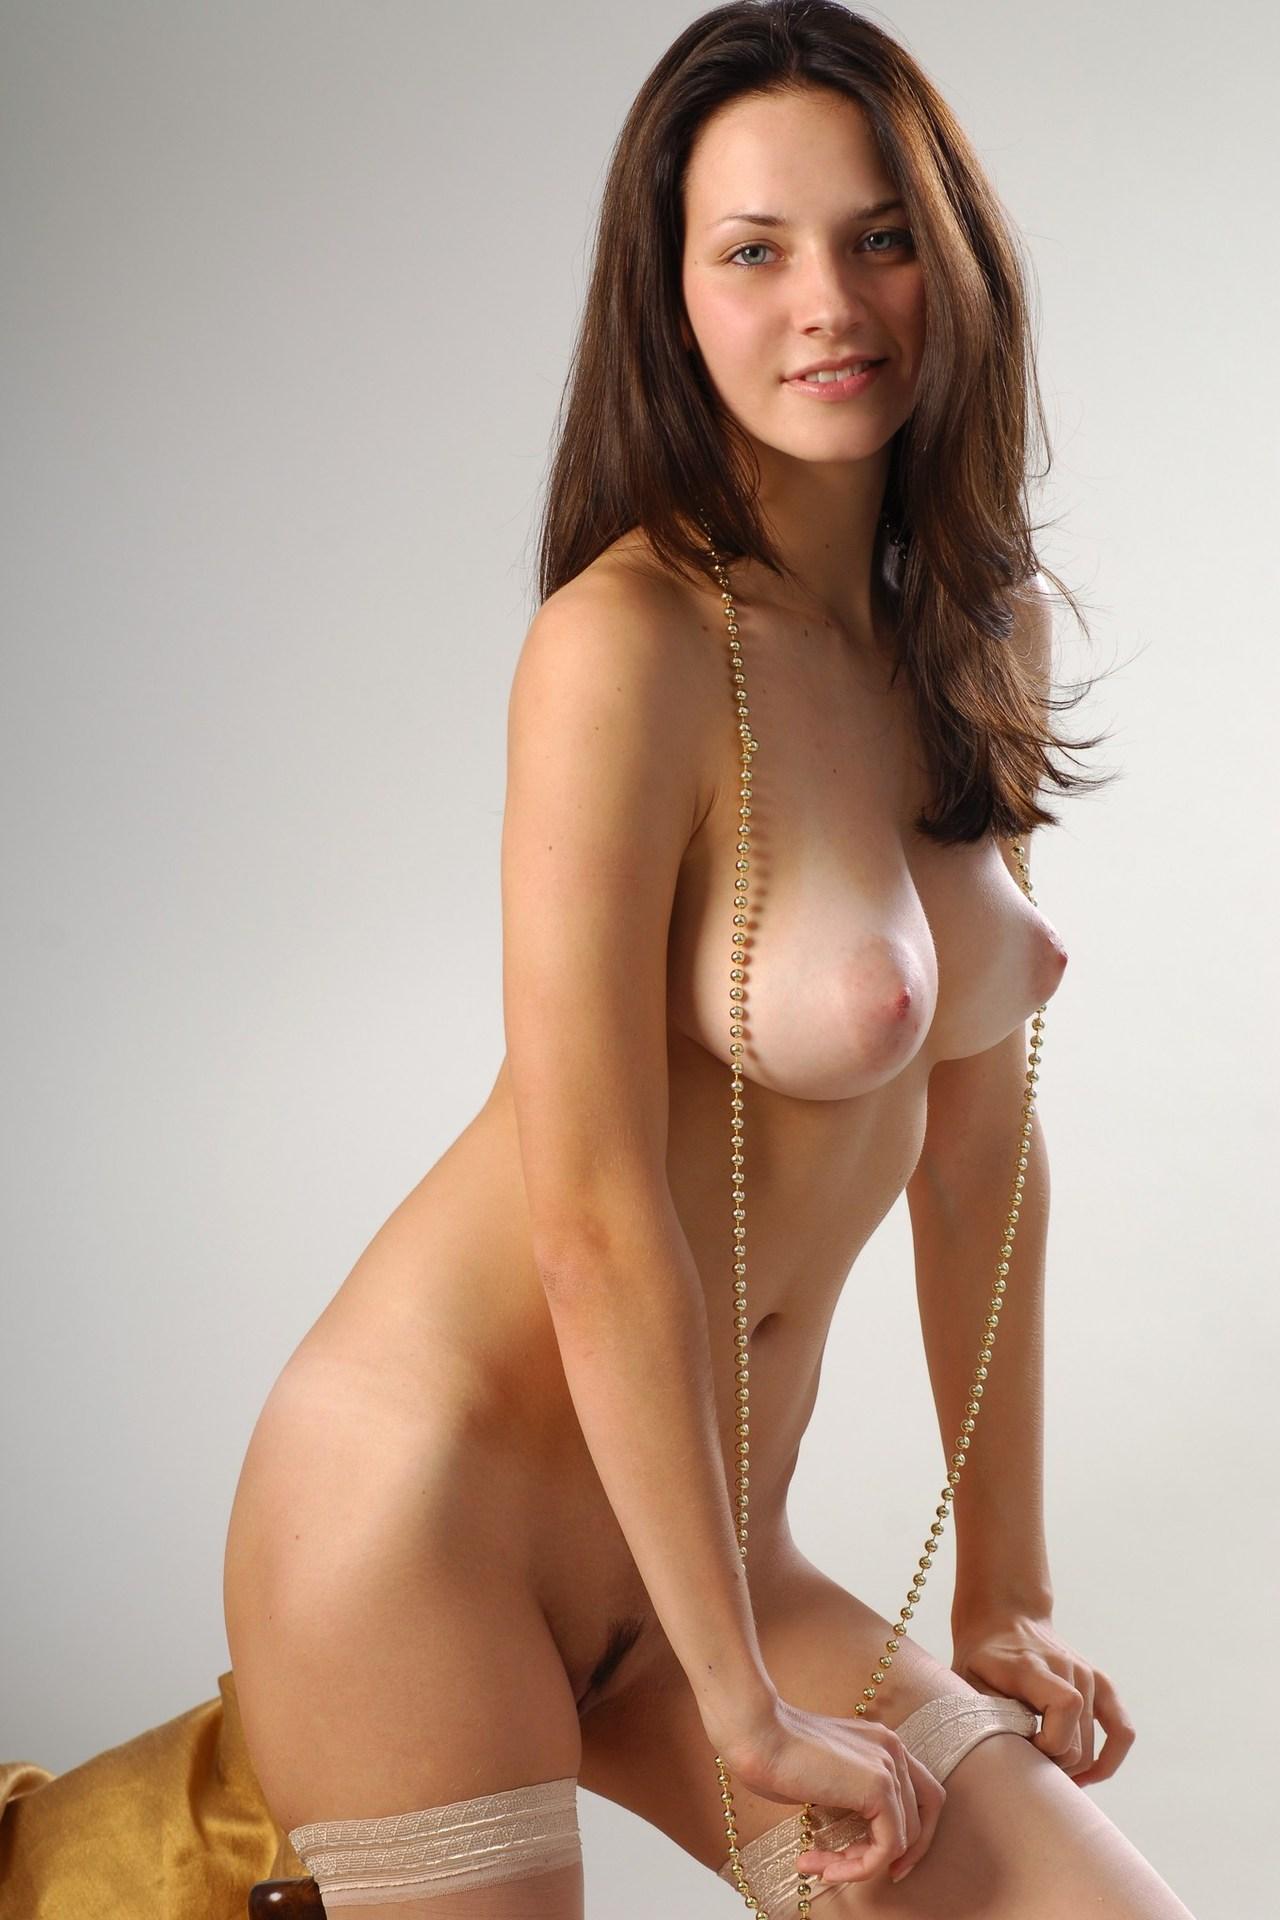 Teen nude amateur video-7048